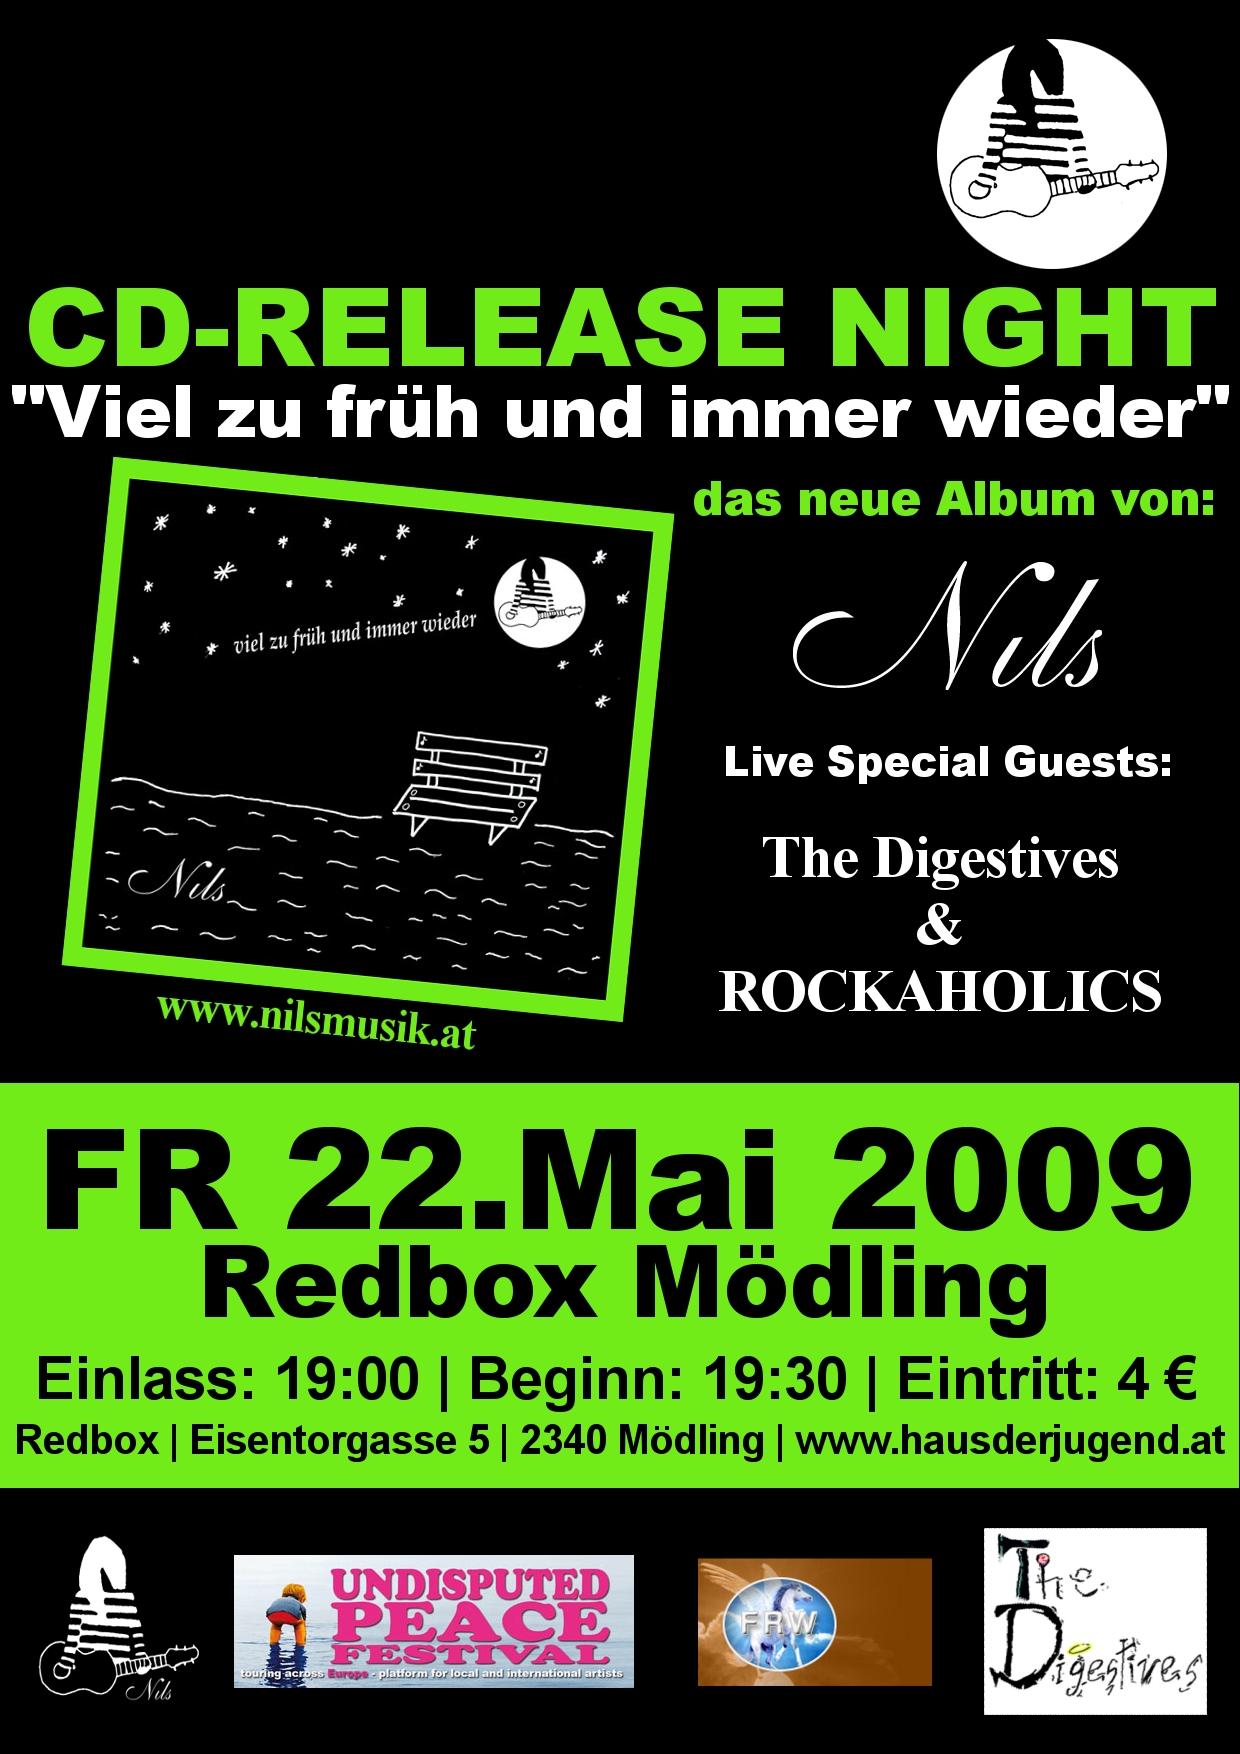 CD-Relaese Night 2009